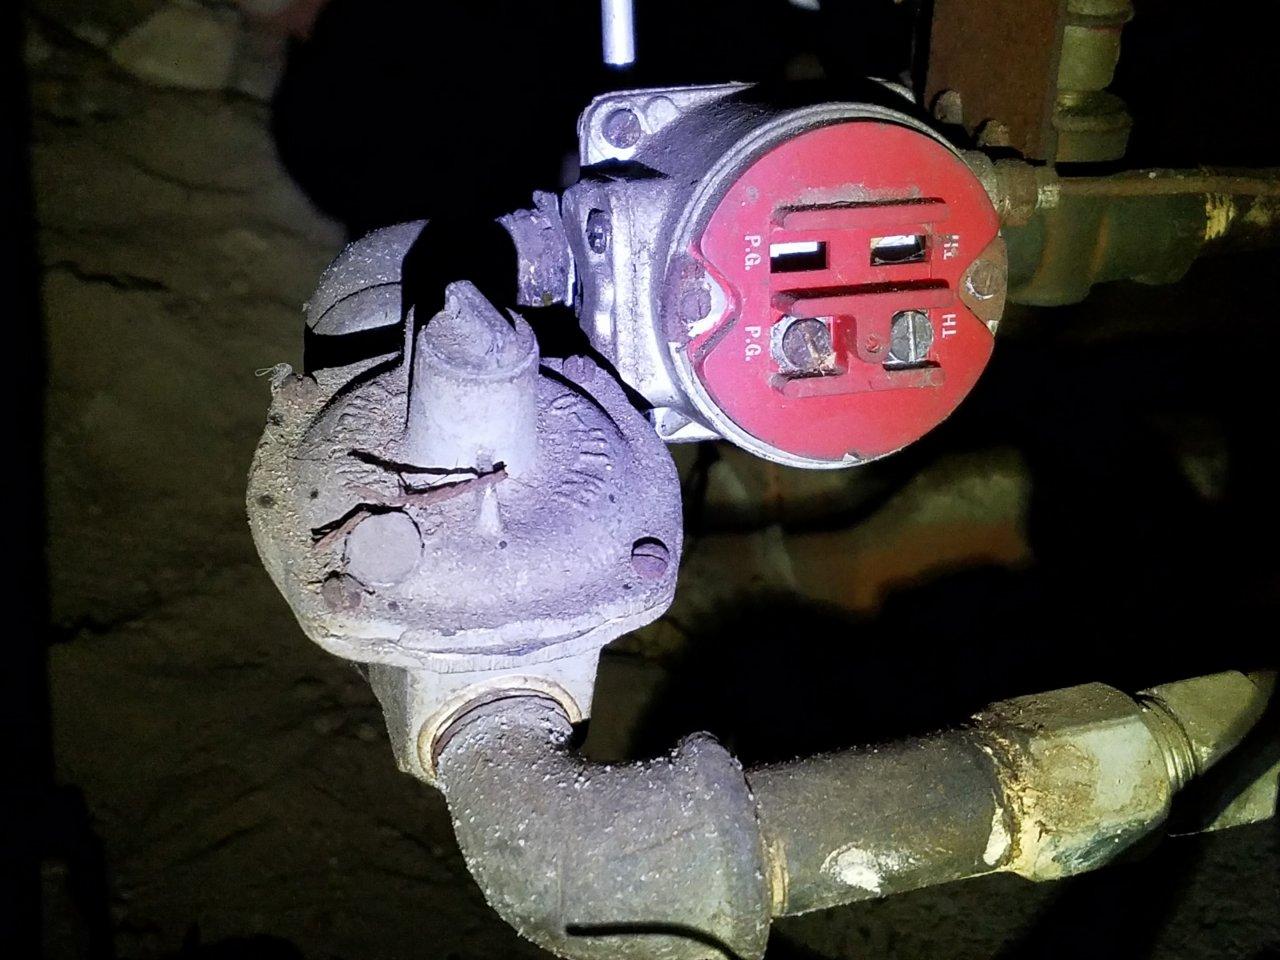 I U0026 39 Ve Got A An Old Floor Furnace With A B60y84h Gas Valve  General Controls